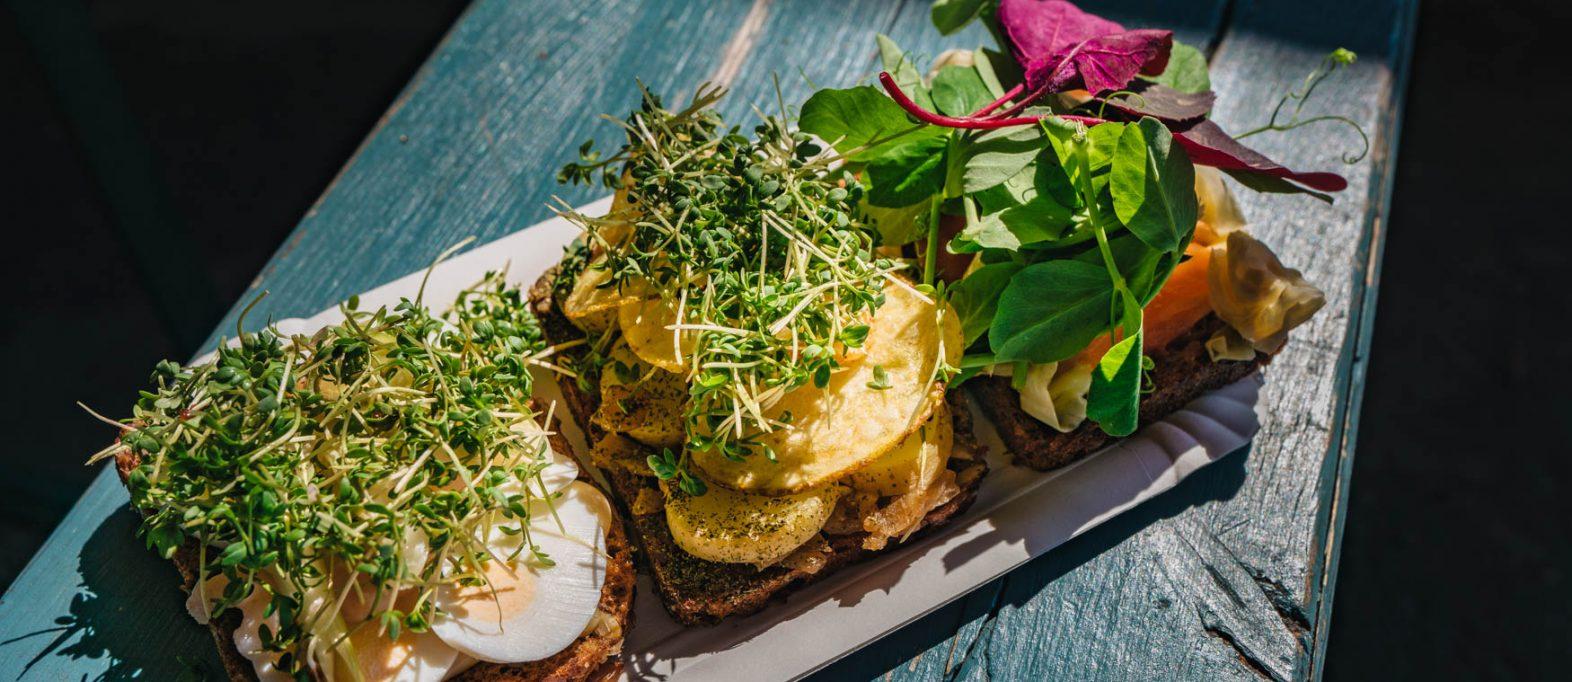 kopenhagen-food-guide-smørrebrøds